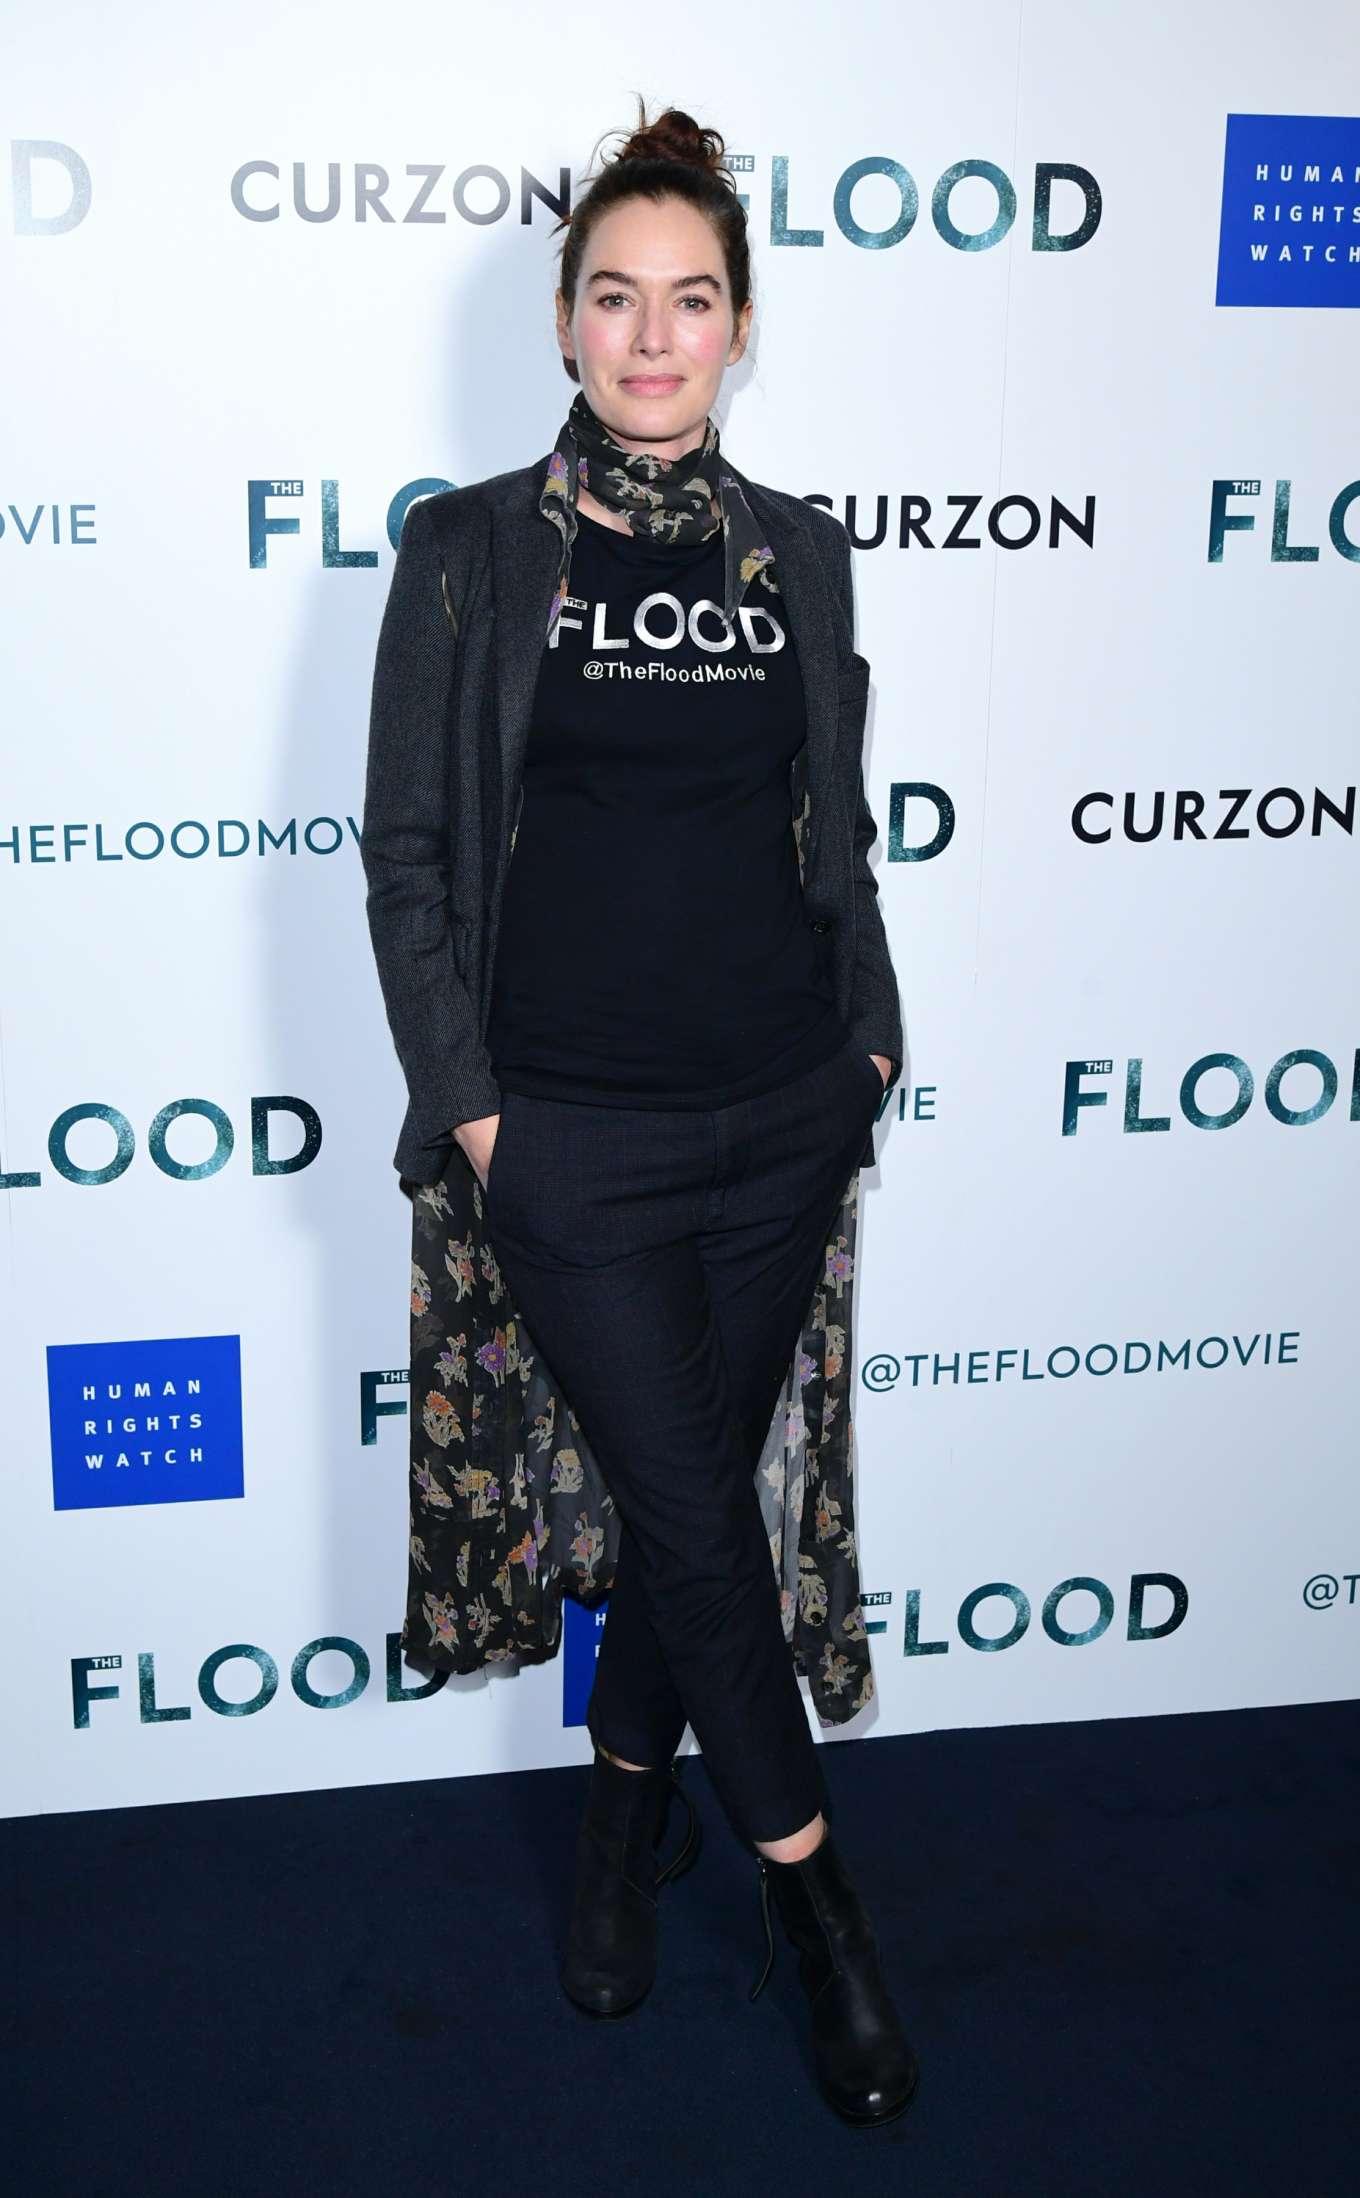 Lena Headey 2019 : Lena Headey: The Flood Screening in London-12